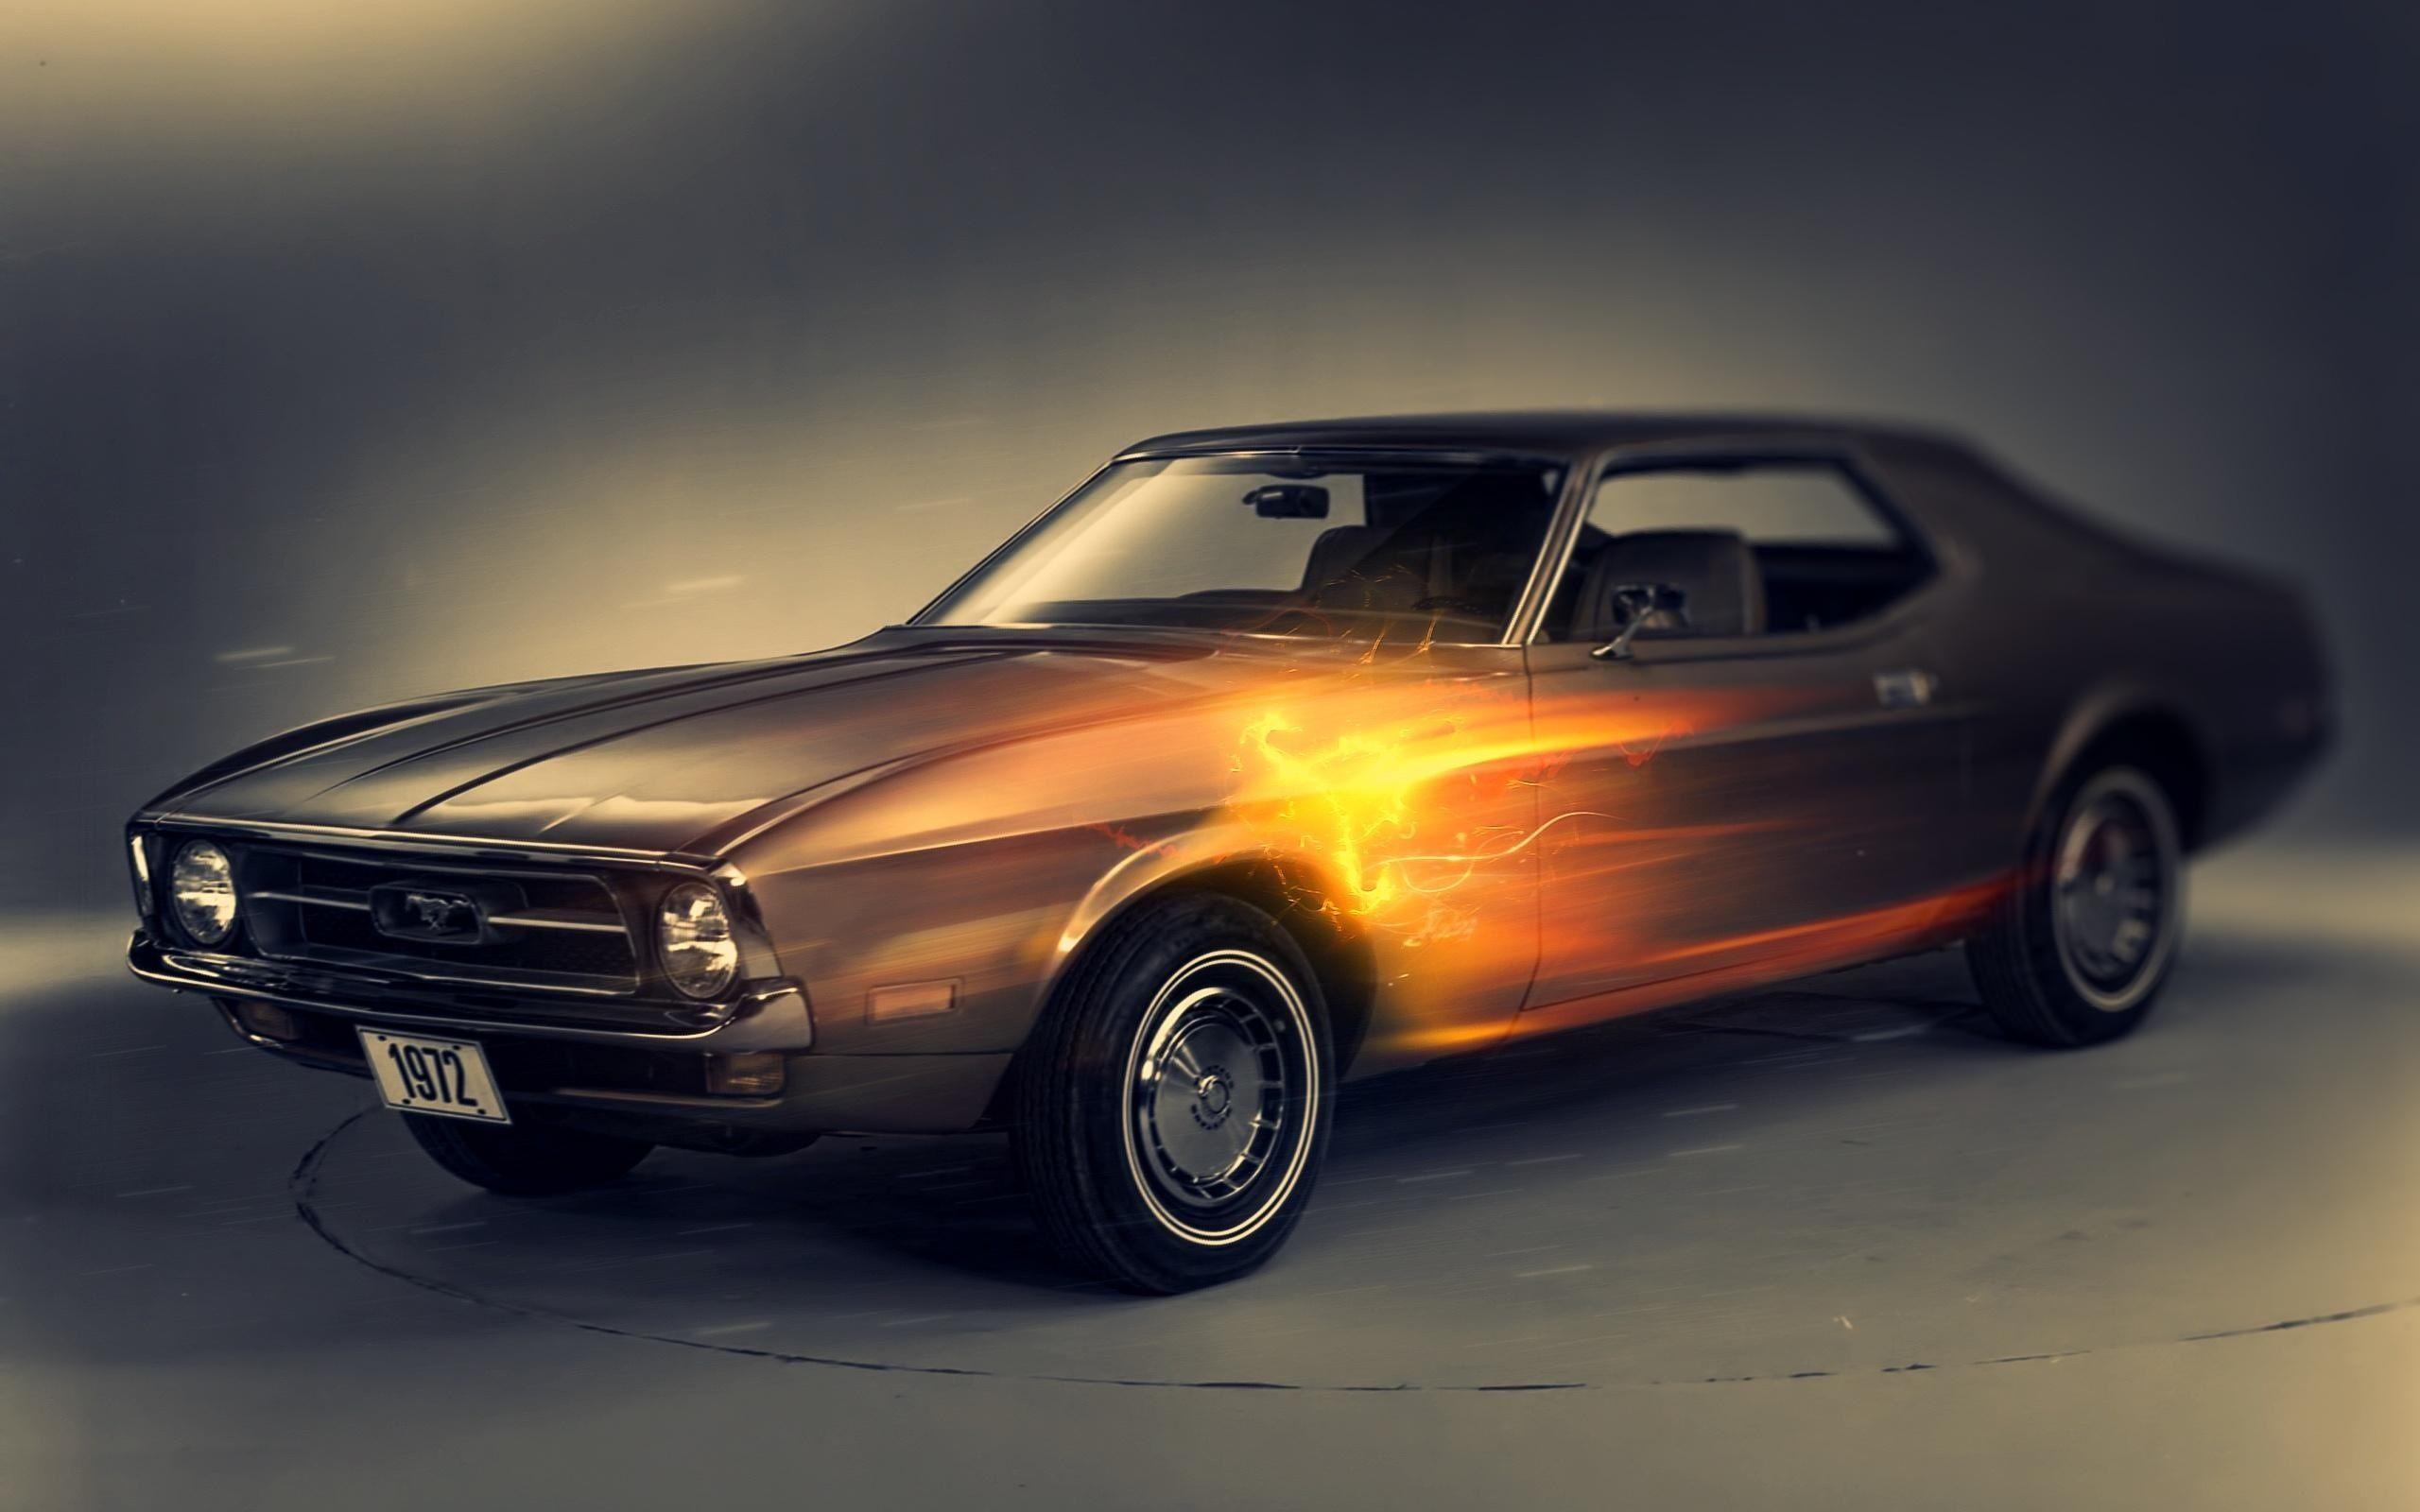 Cars Hd Wallpapers And Desktops Mustang Wallpaper Ford Mustang Wallpaper Ford Mustang